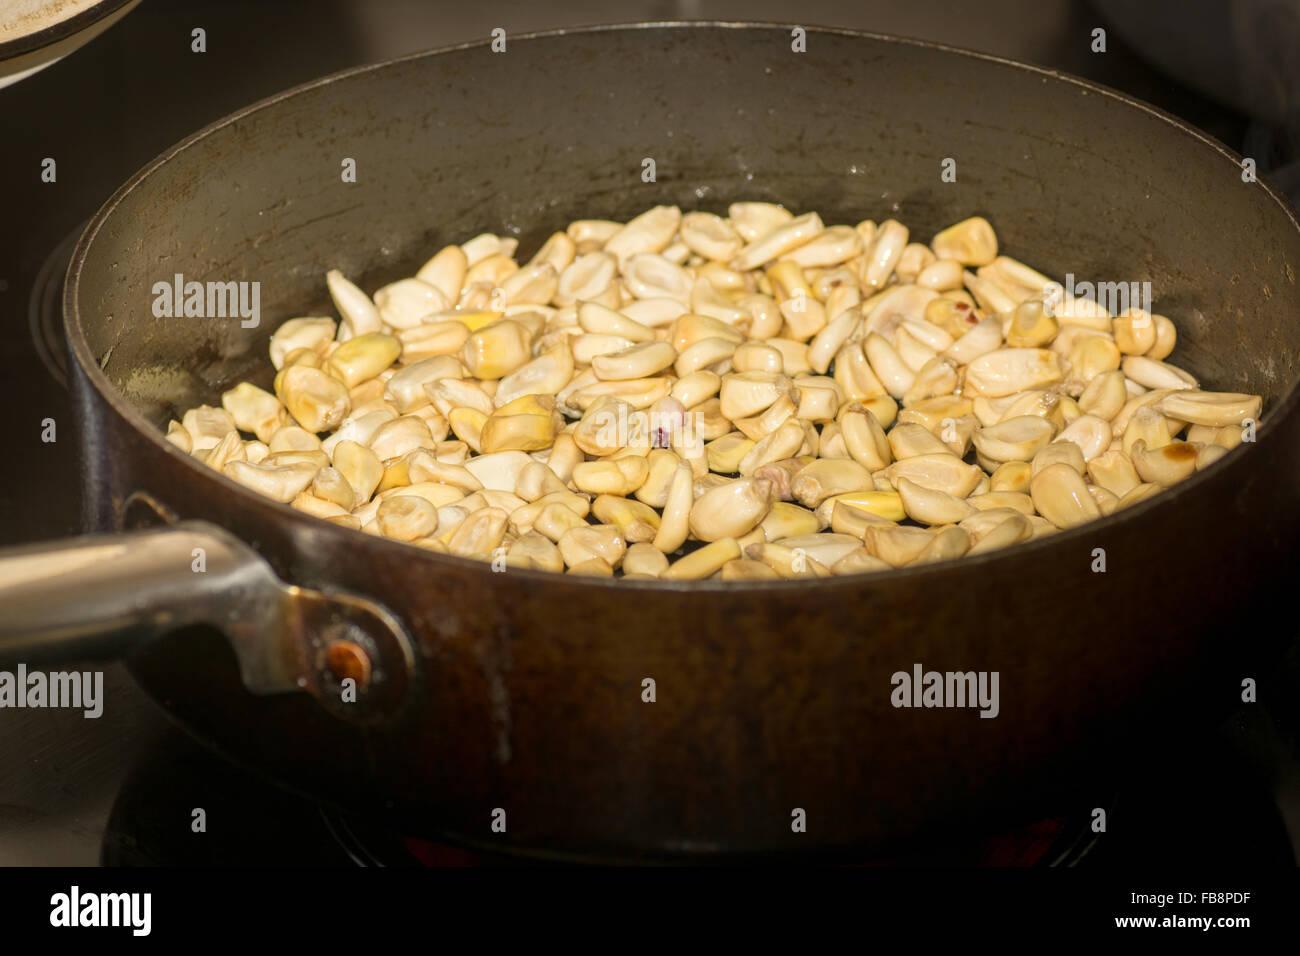 Peruvian corn stock photos peruvian corn stock images alamy toasting peruvian corn or cancha stock image forumfinder Choice Image